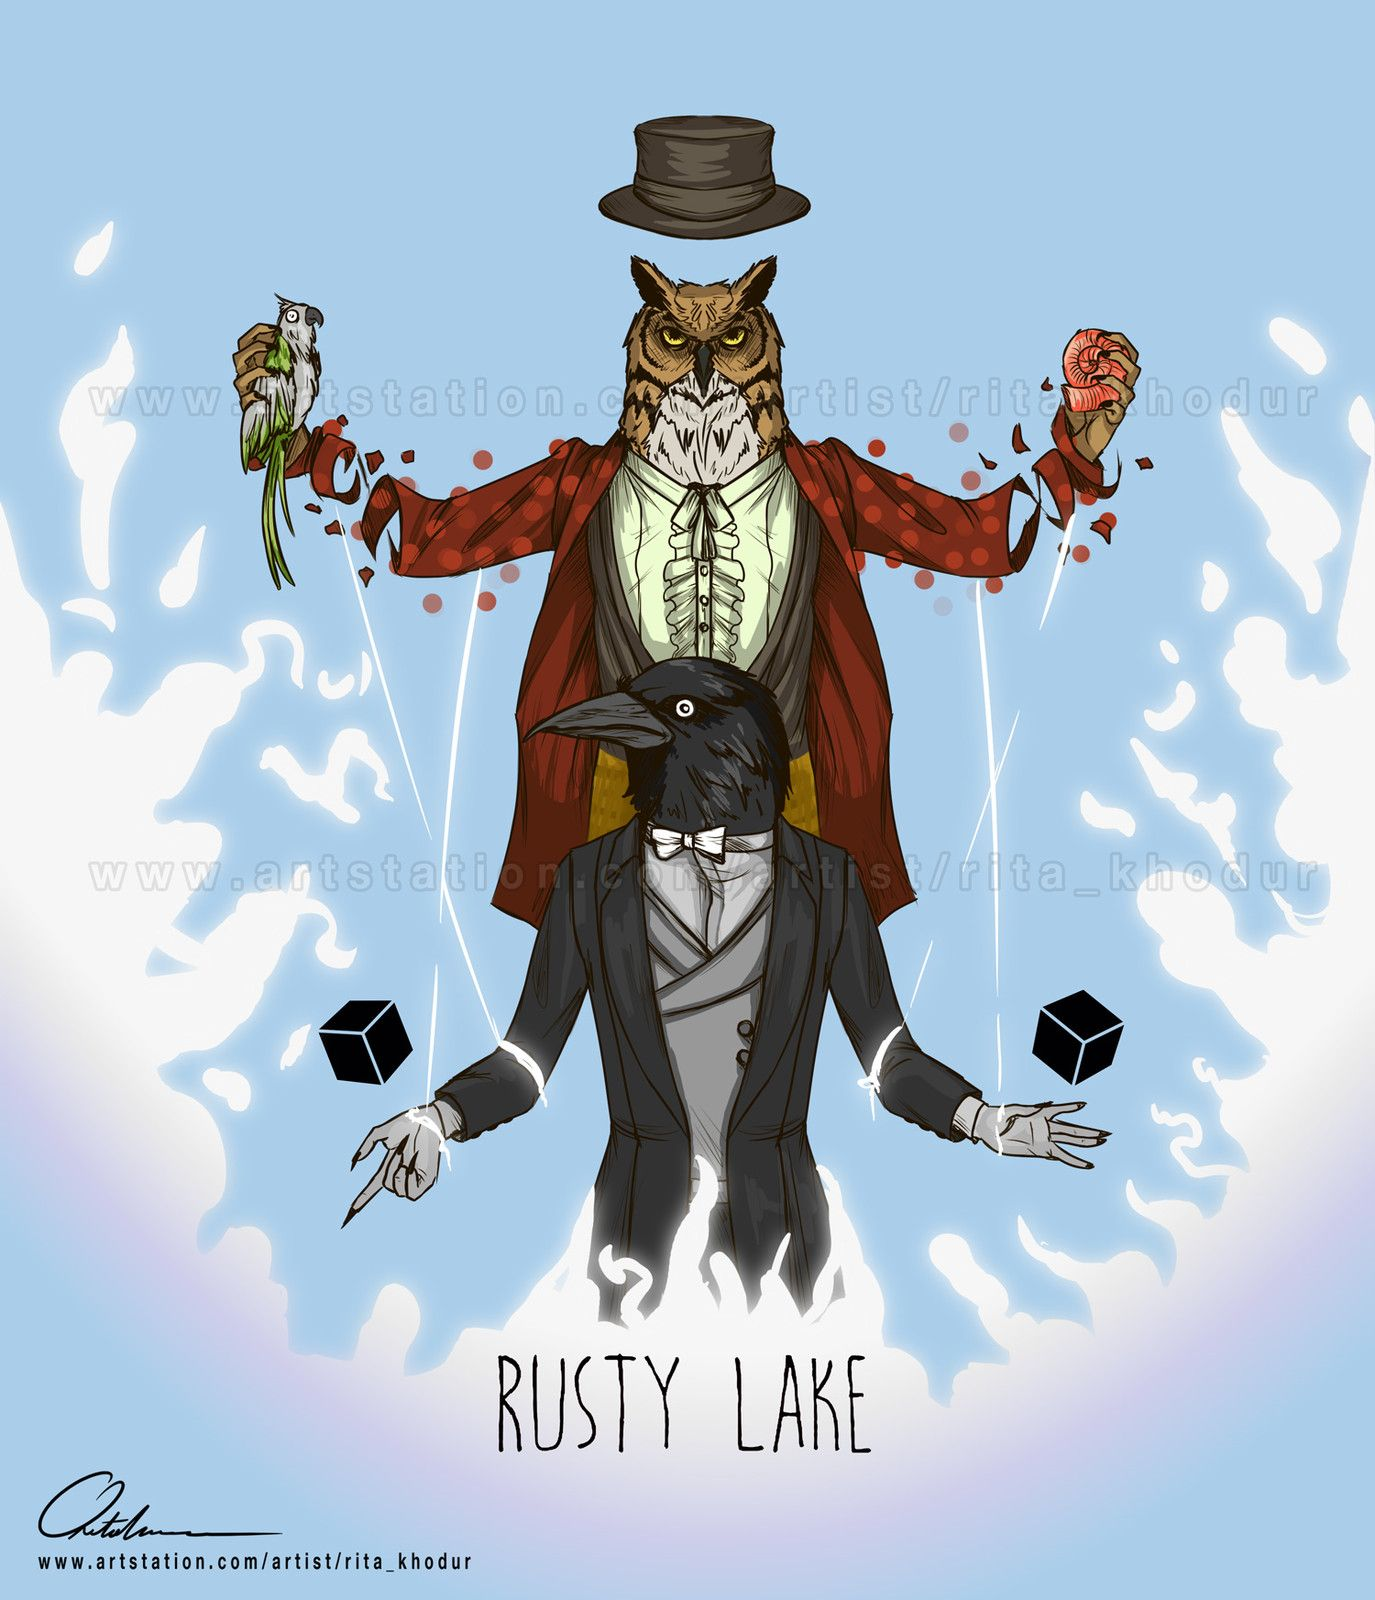 Rusty Lake Fanart, Rita Khodur on ArtStation at https://www.artstation.com/artwork/APg3y